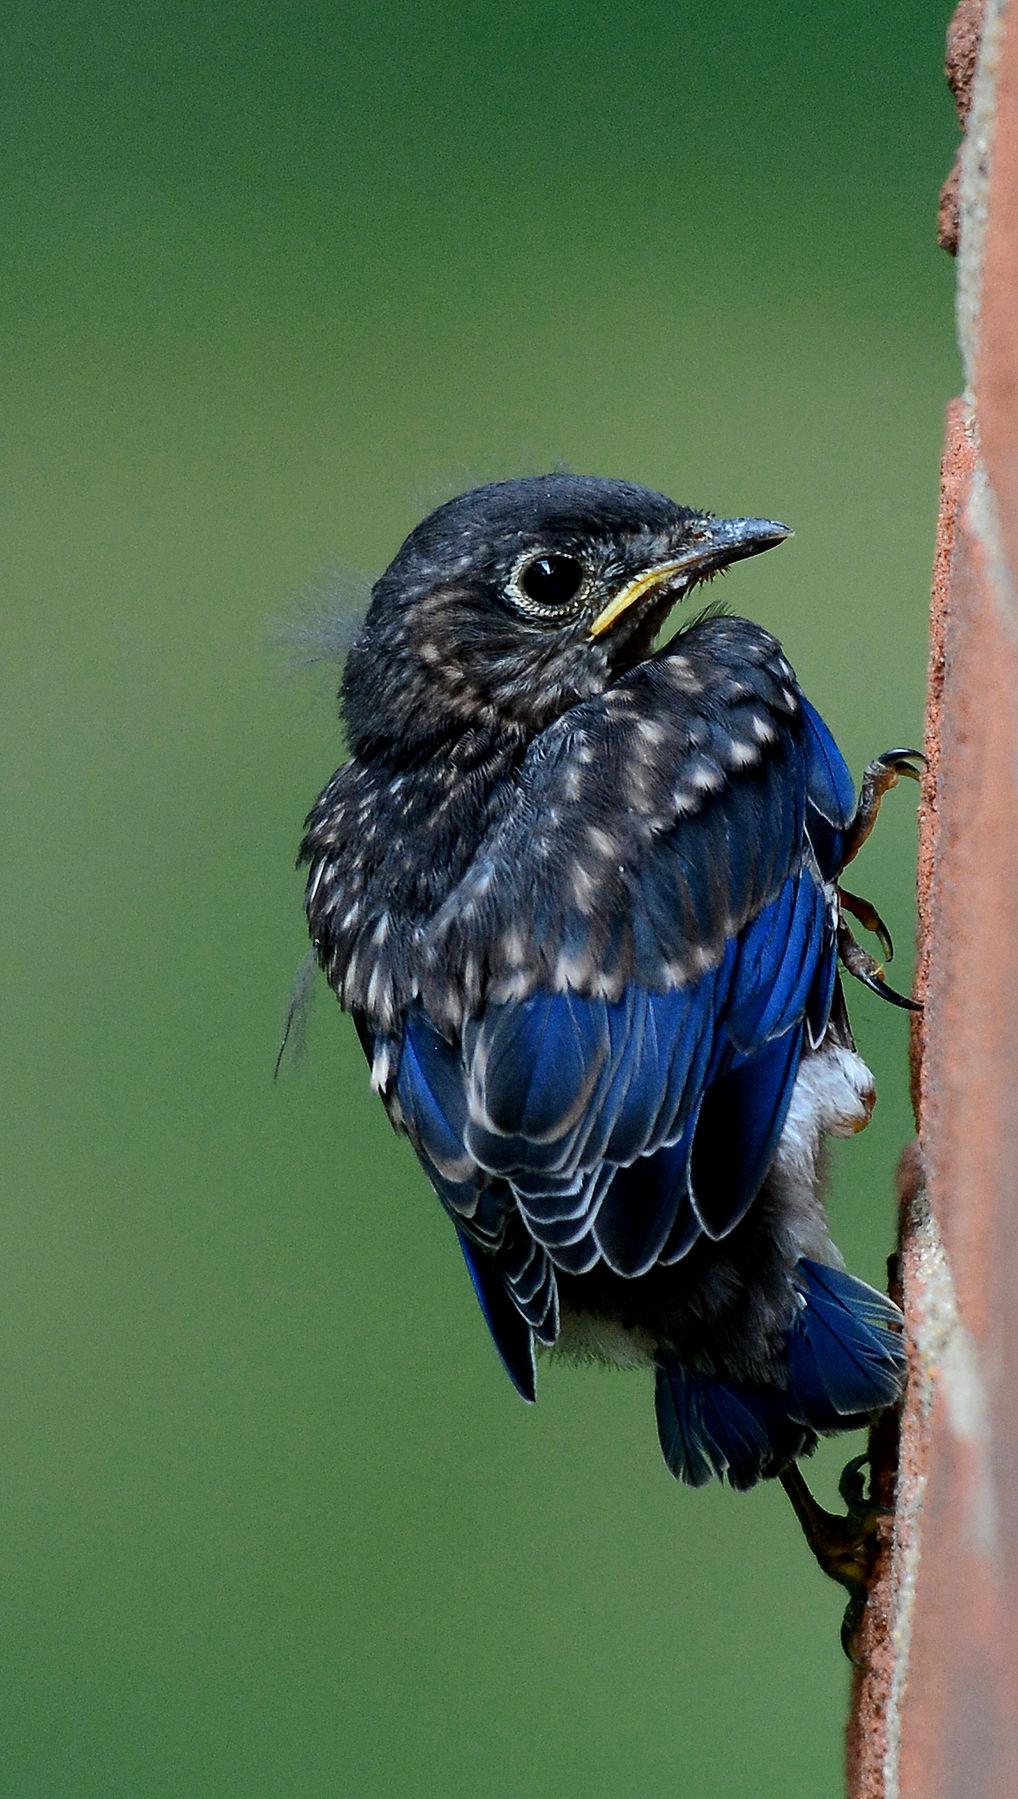 Baby_Bluebird_Fledging_7_2_17